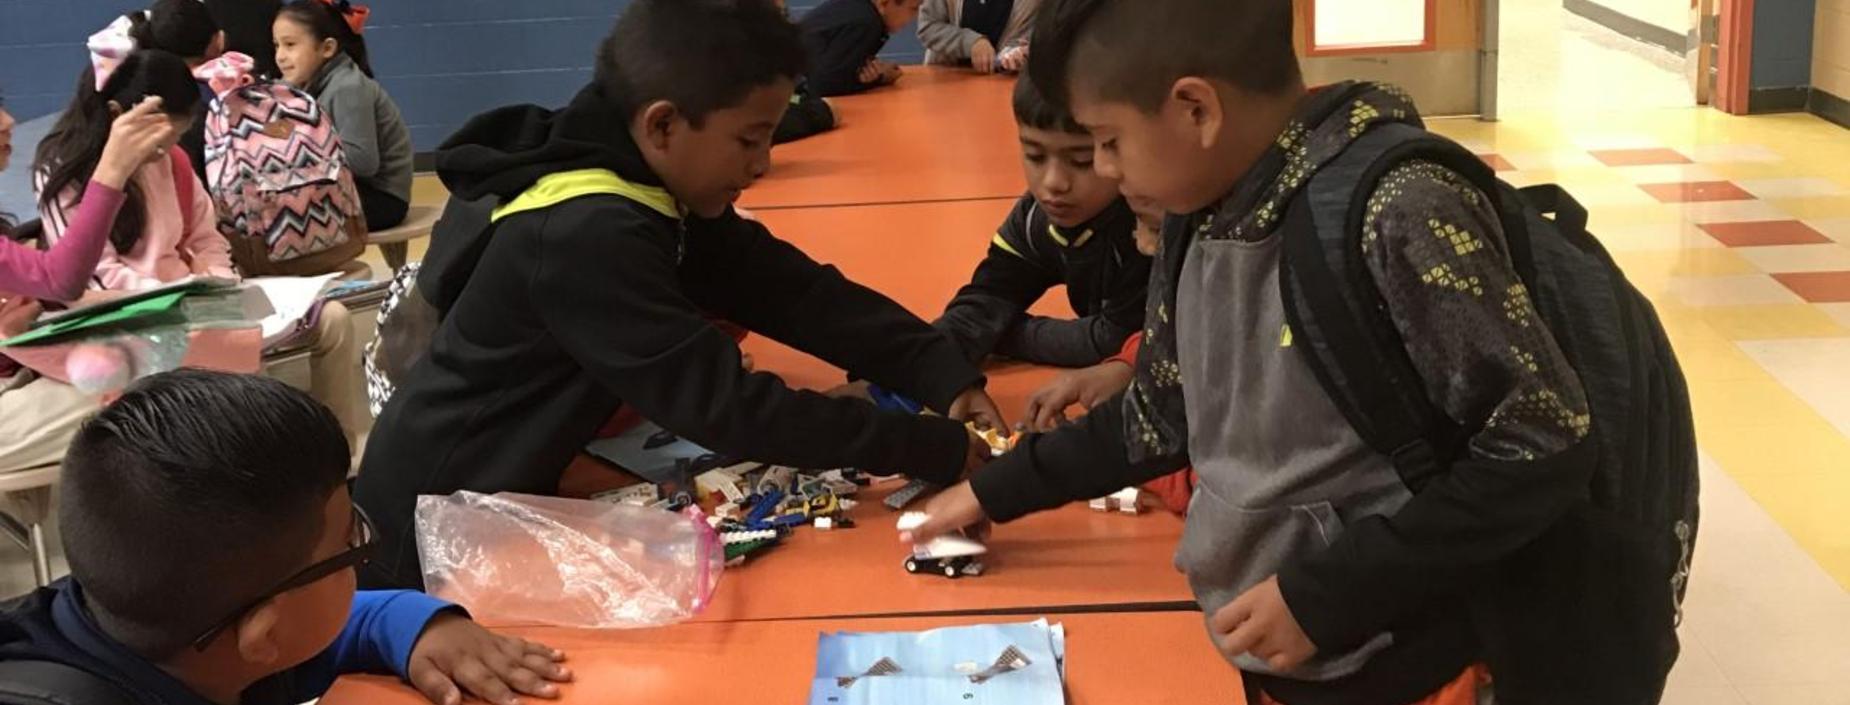 students using legos